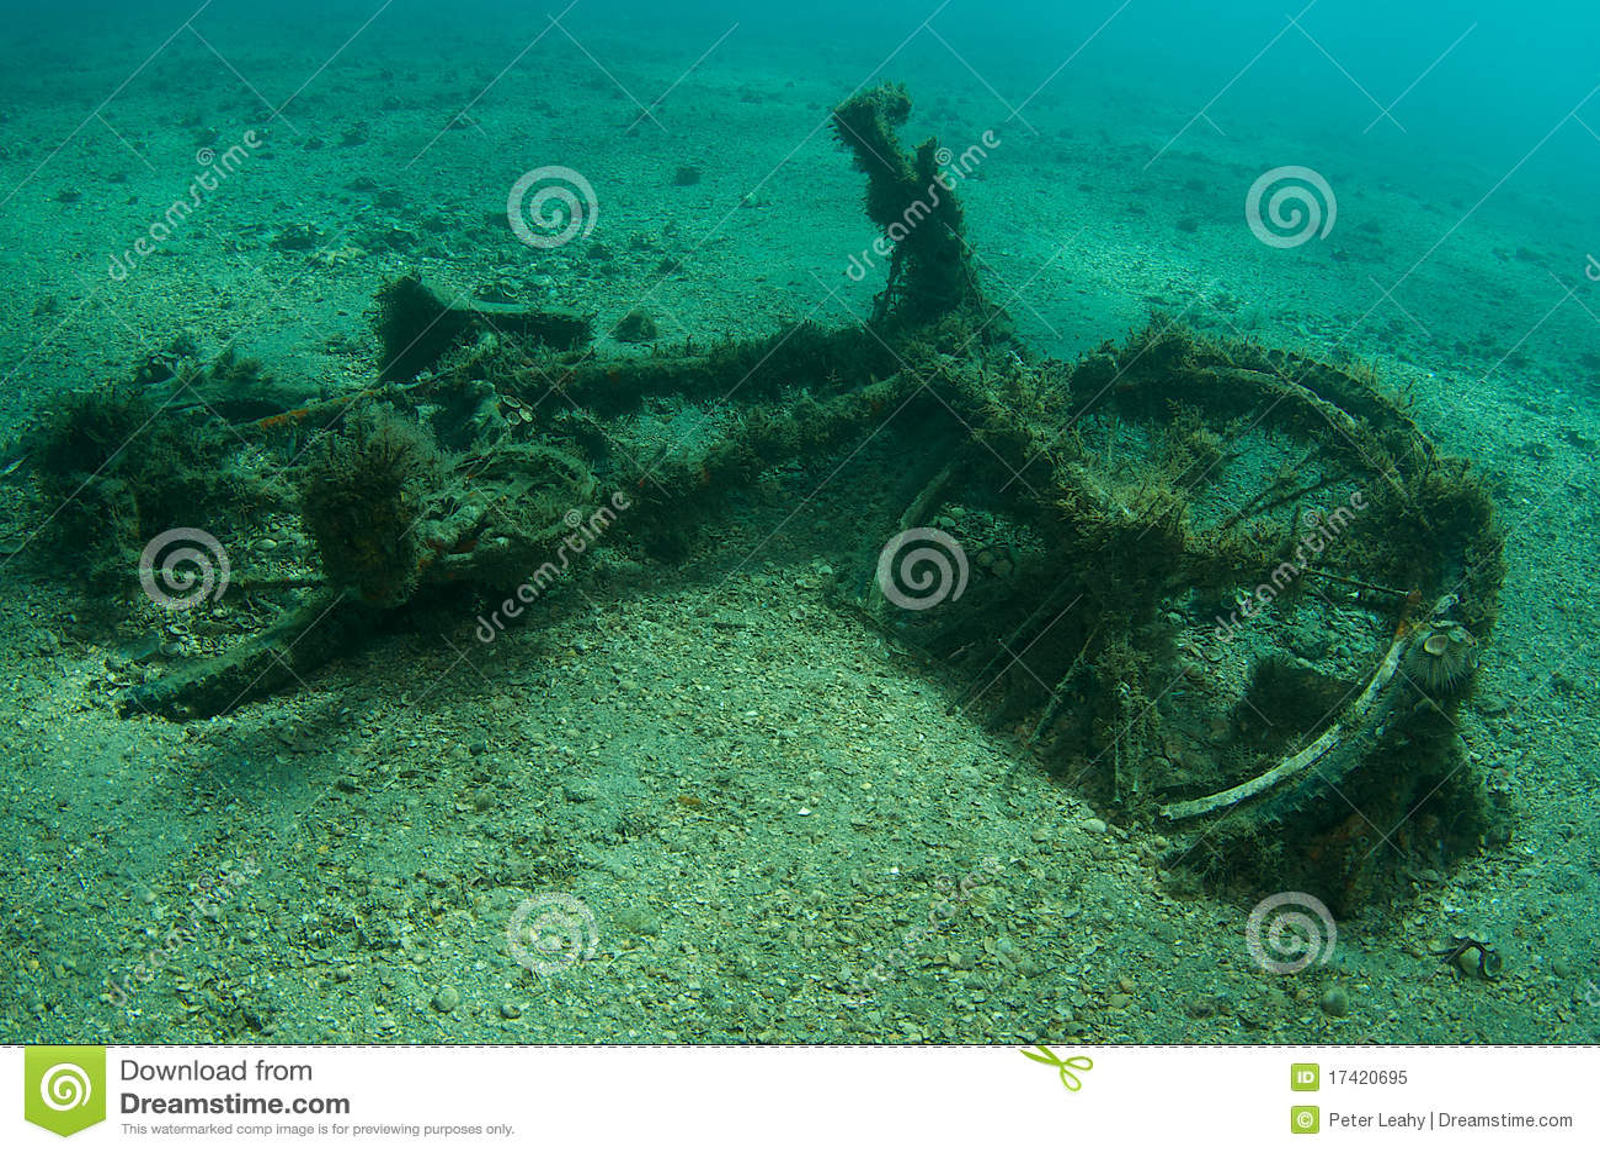 Underwater bicycle